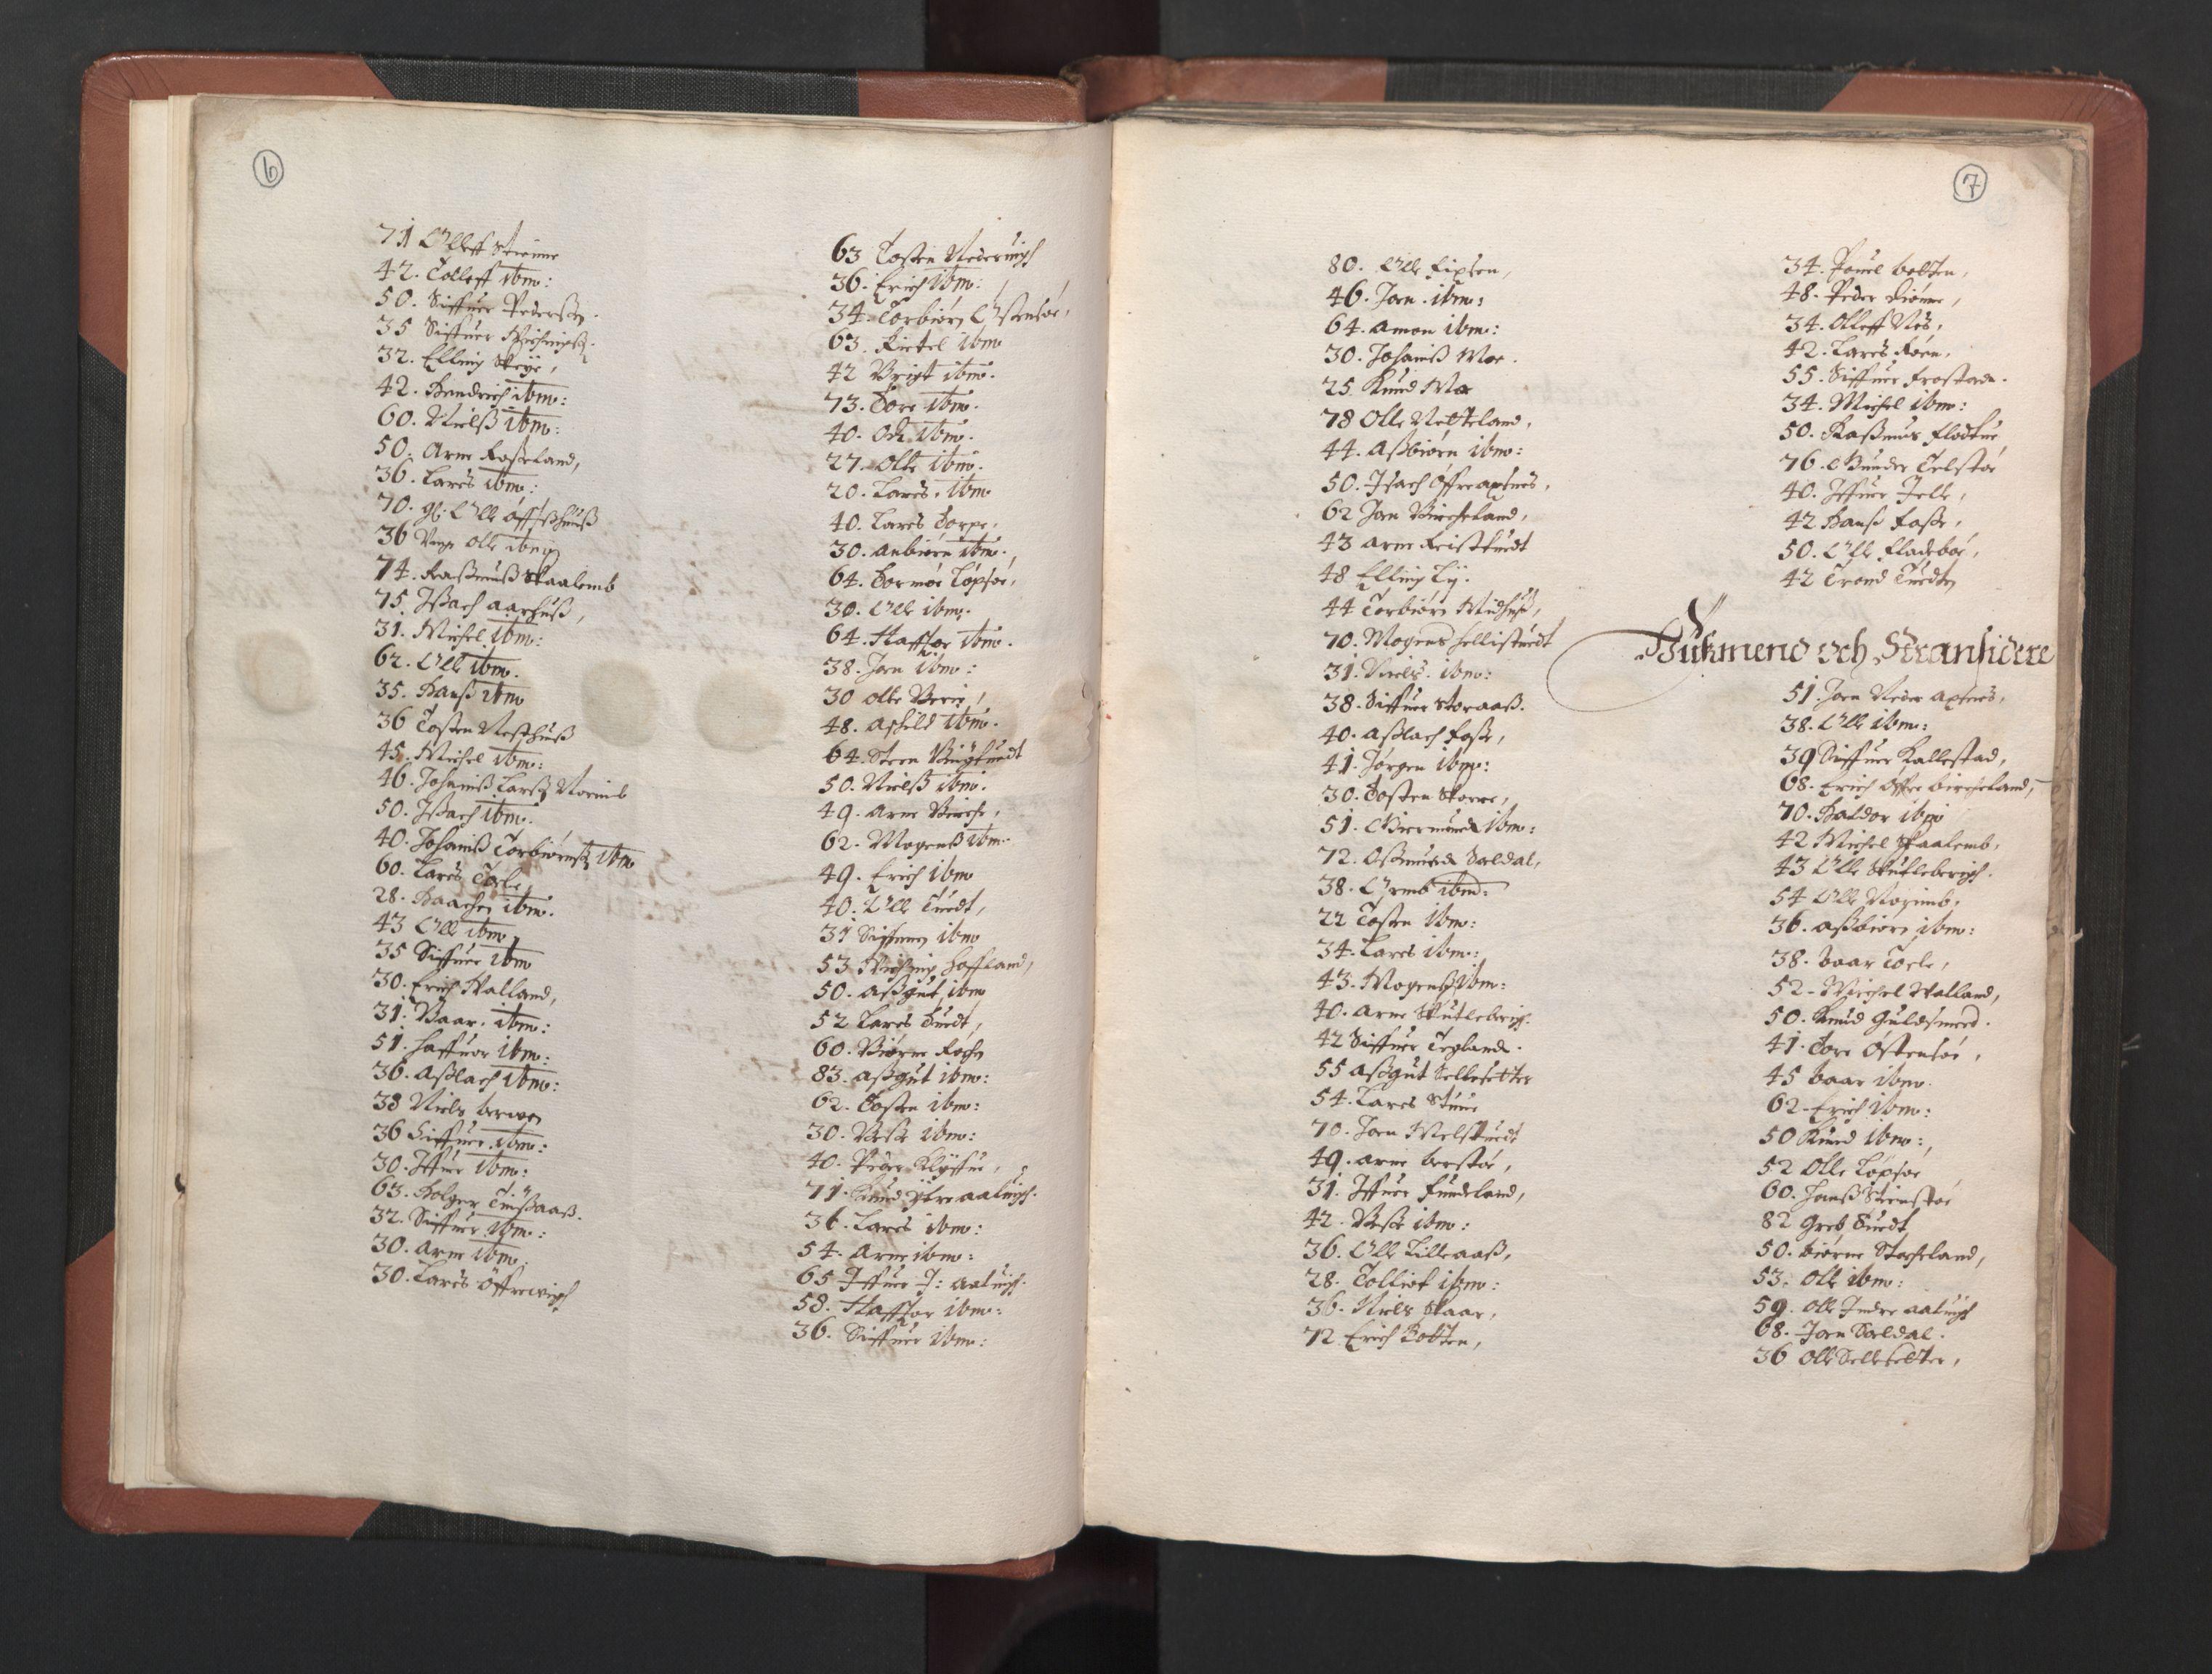 RA, Fogdenes og sorenskrivernes manntall 1664-1666, nr. 14: Hardanger len, Ytre Sogn fogderi og Indre Sogn fogderi, 1664-1665, s. 6-7